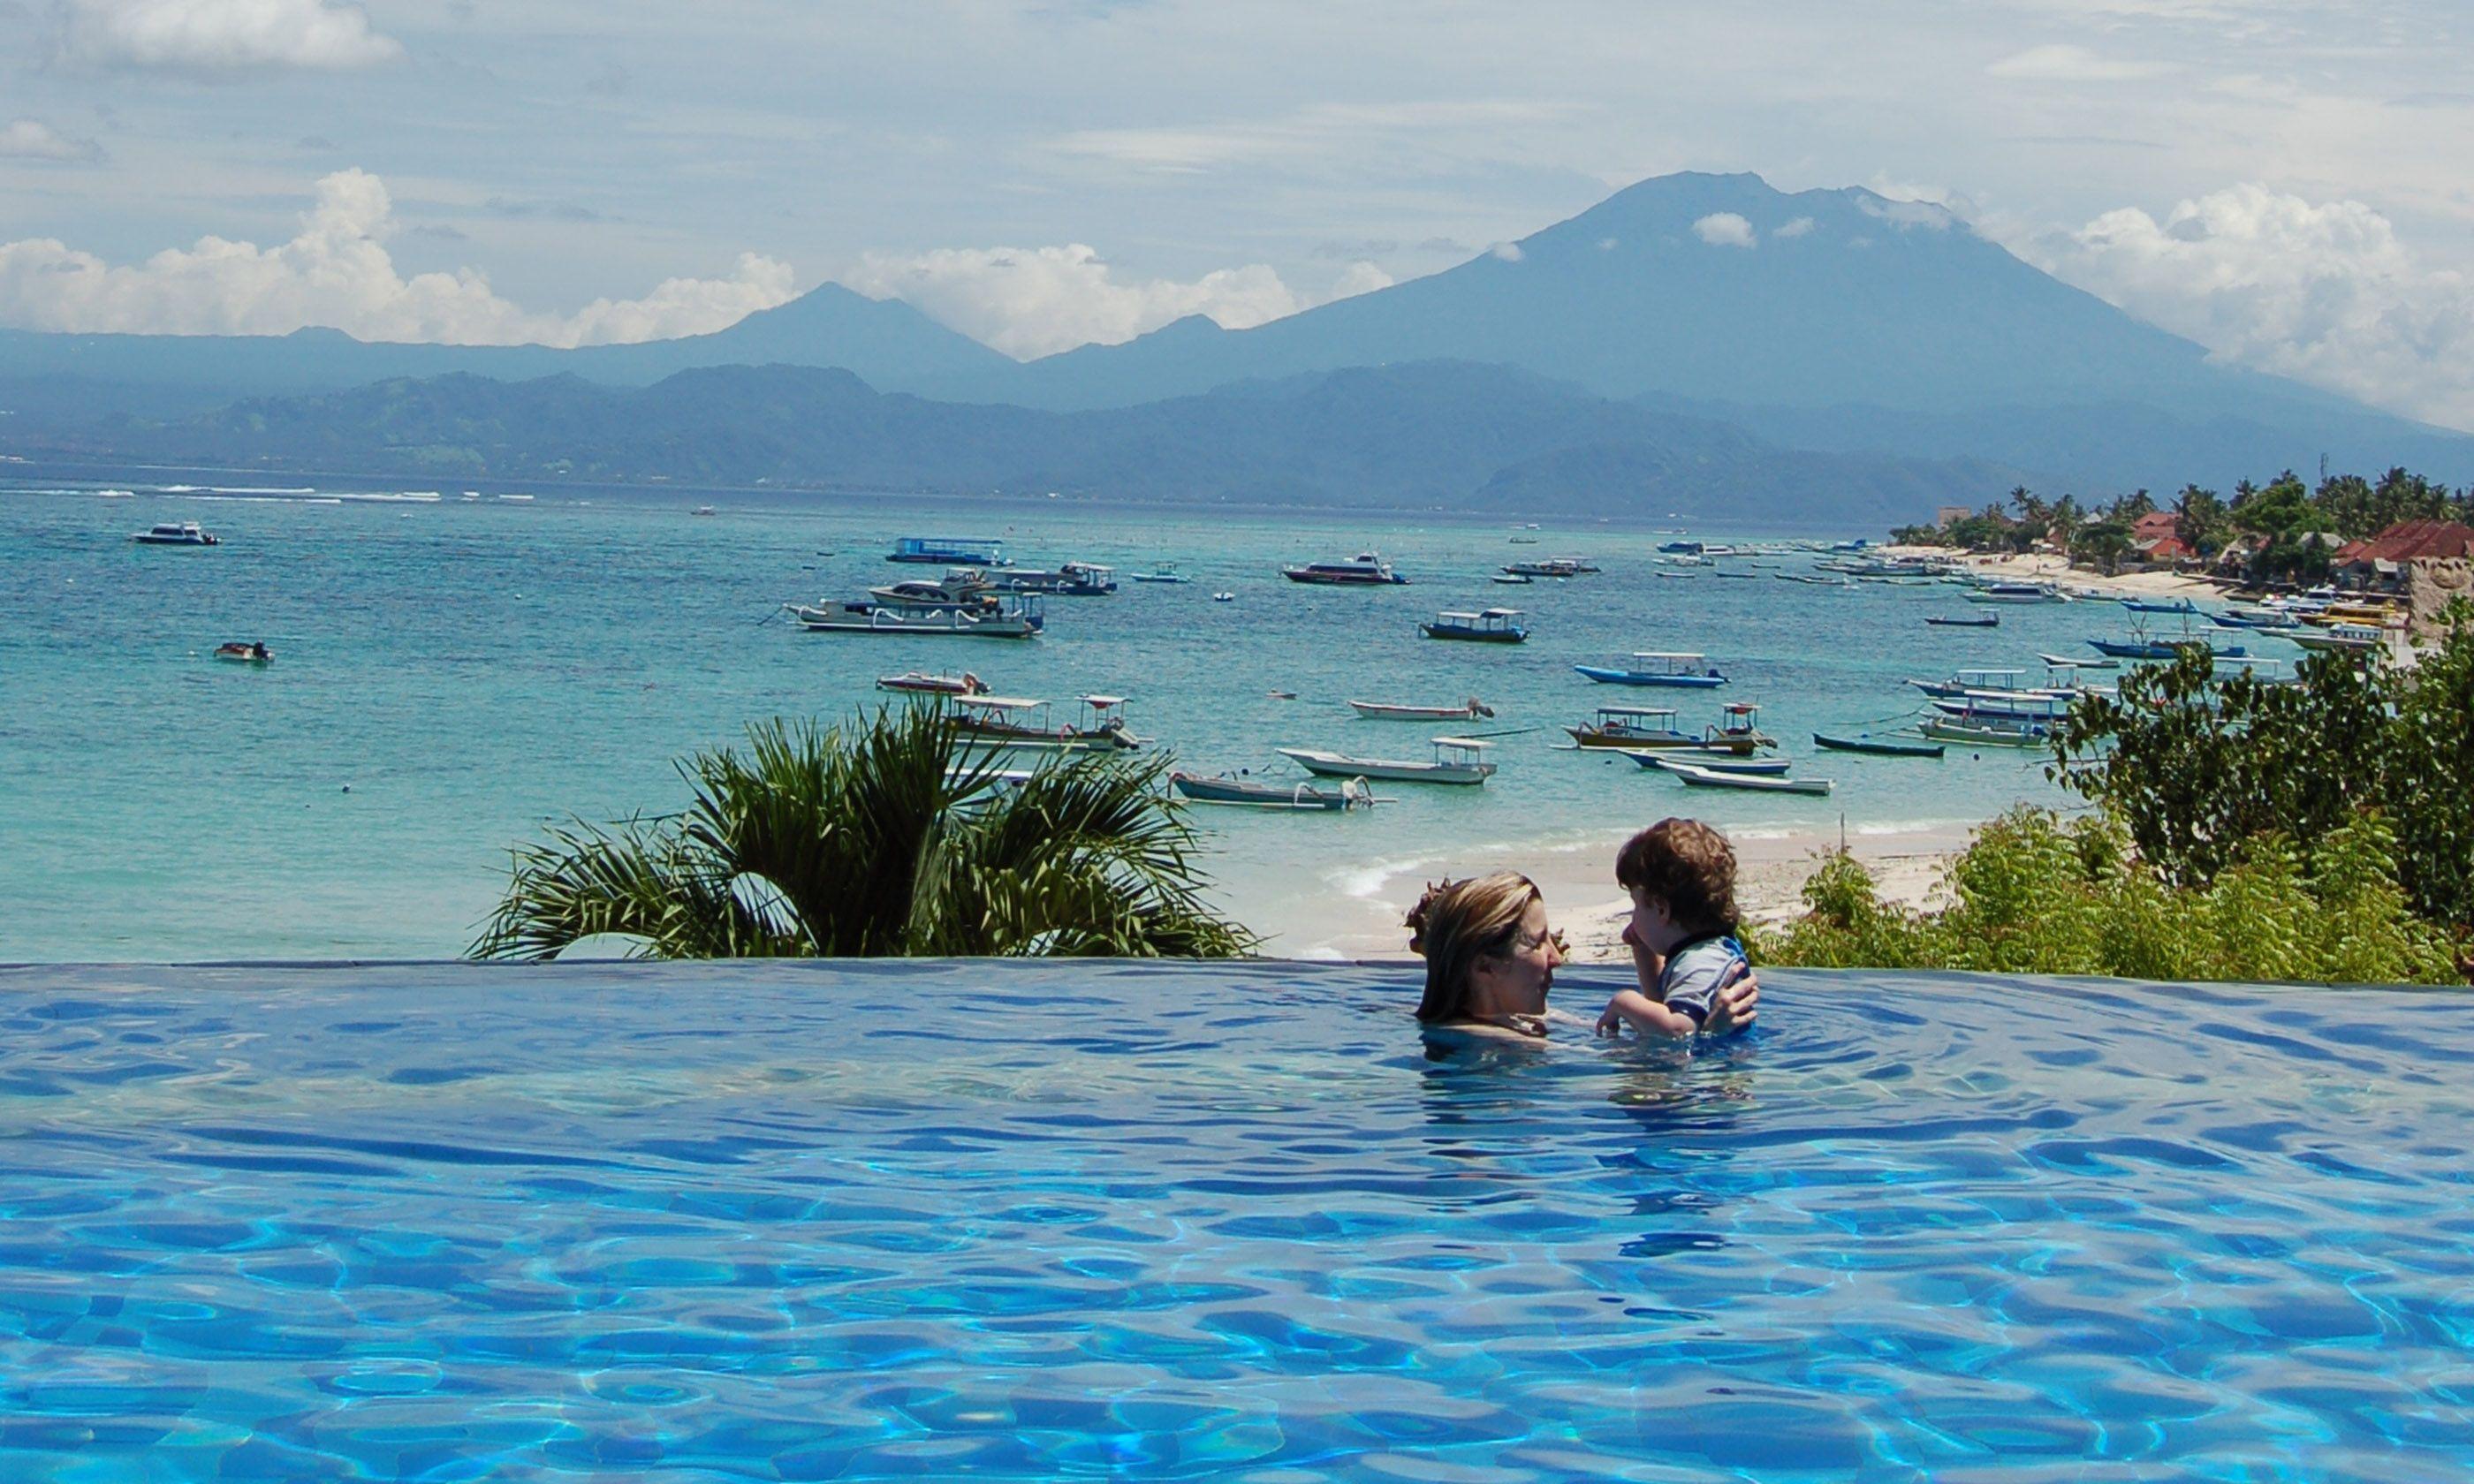 Resort pool in Bali (Brian Thacker)